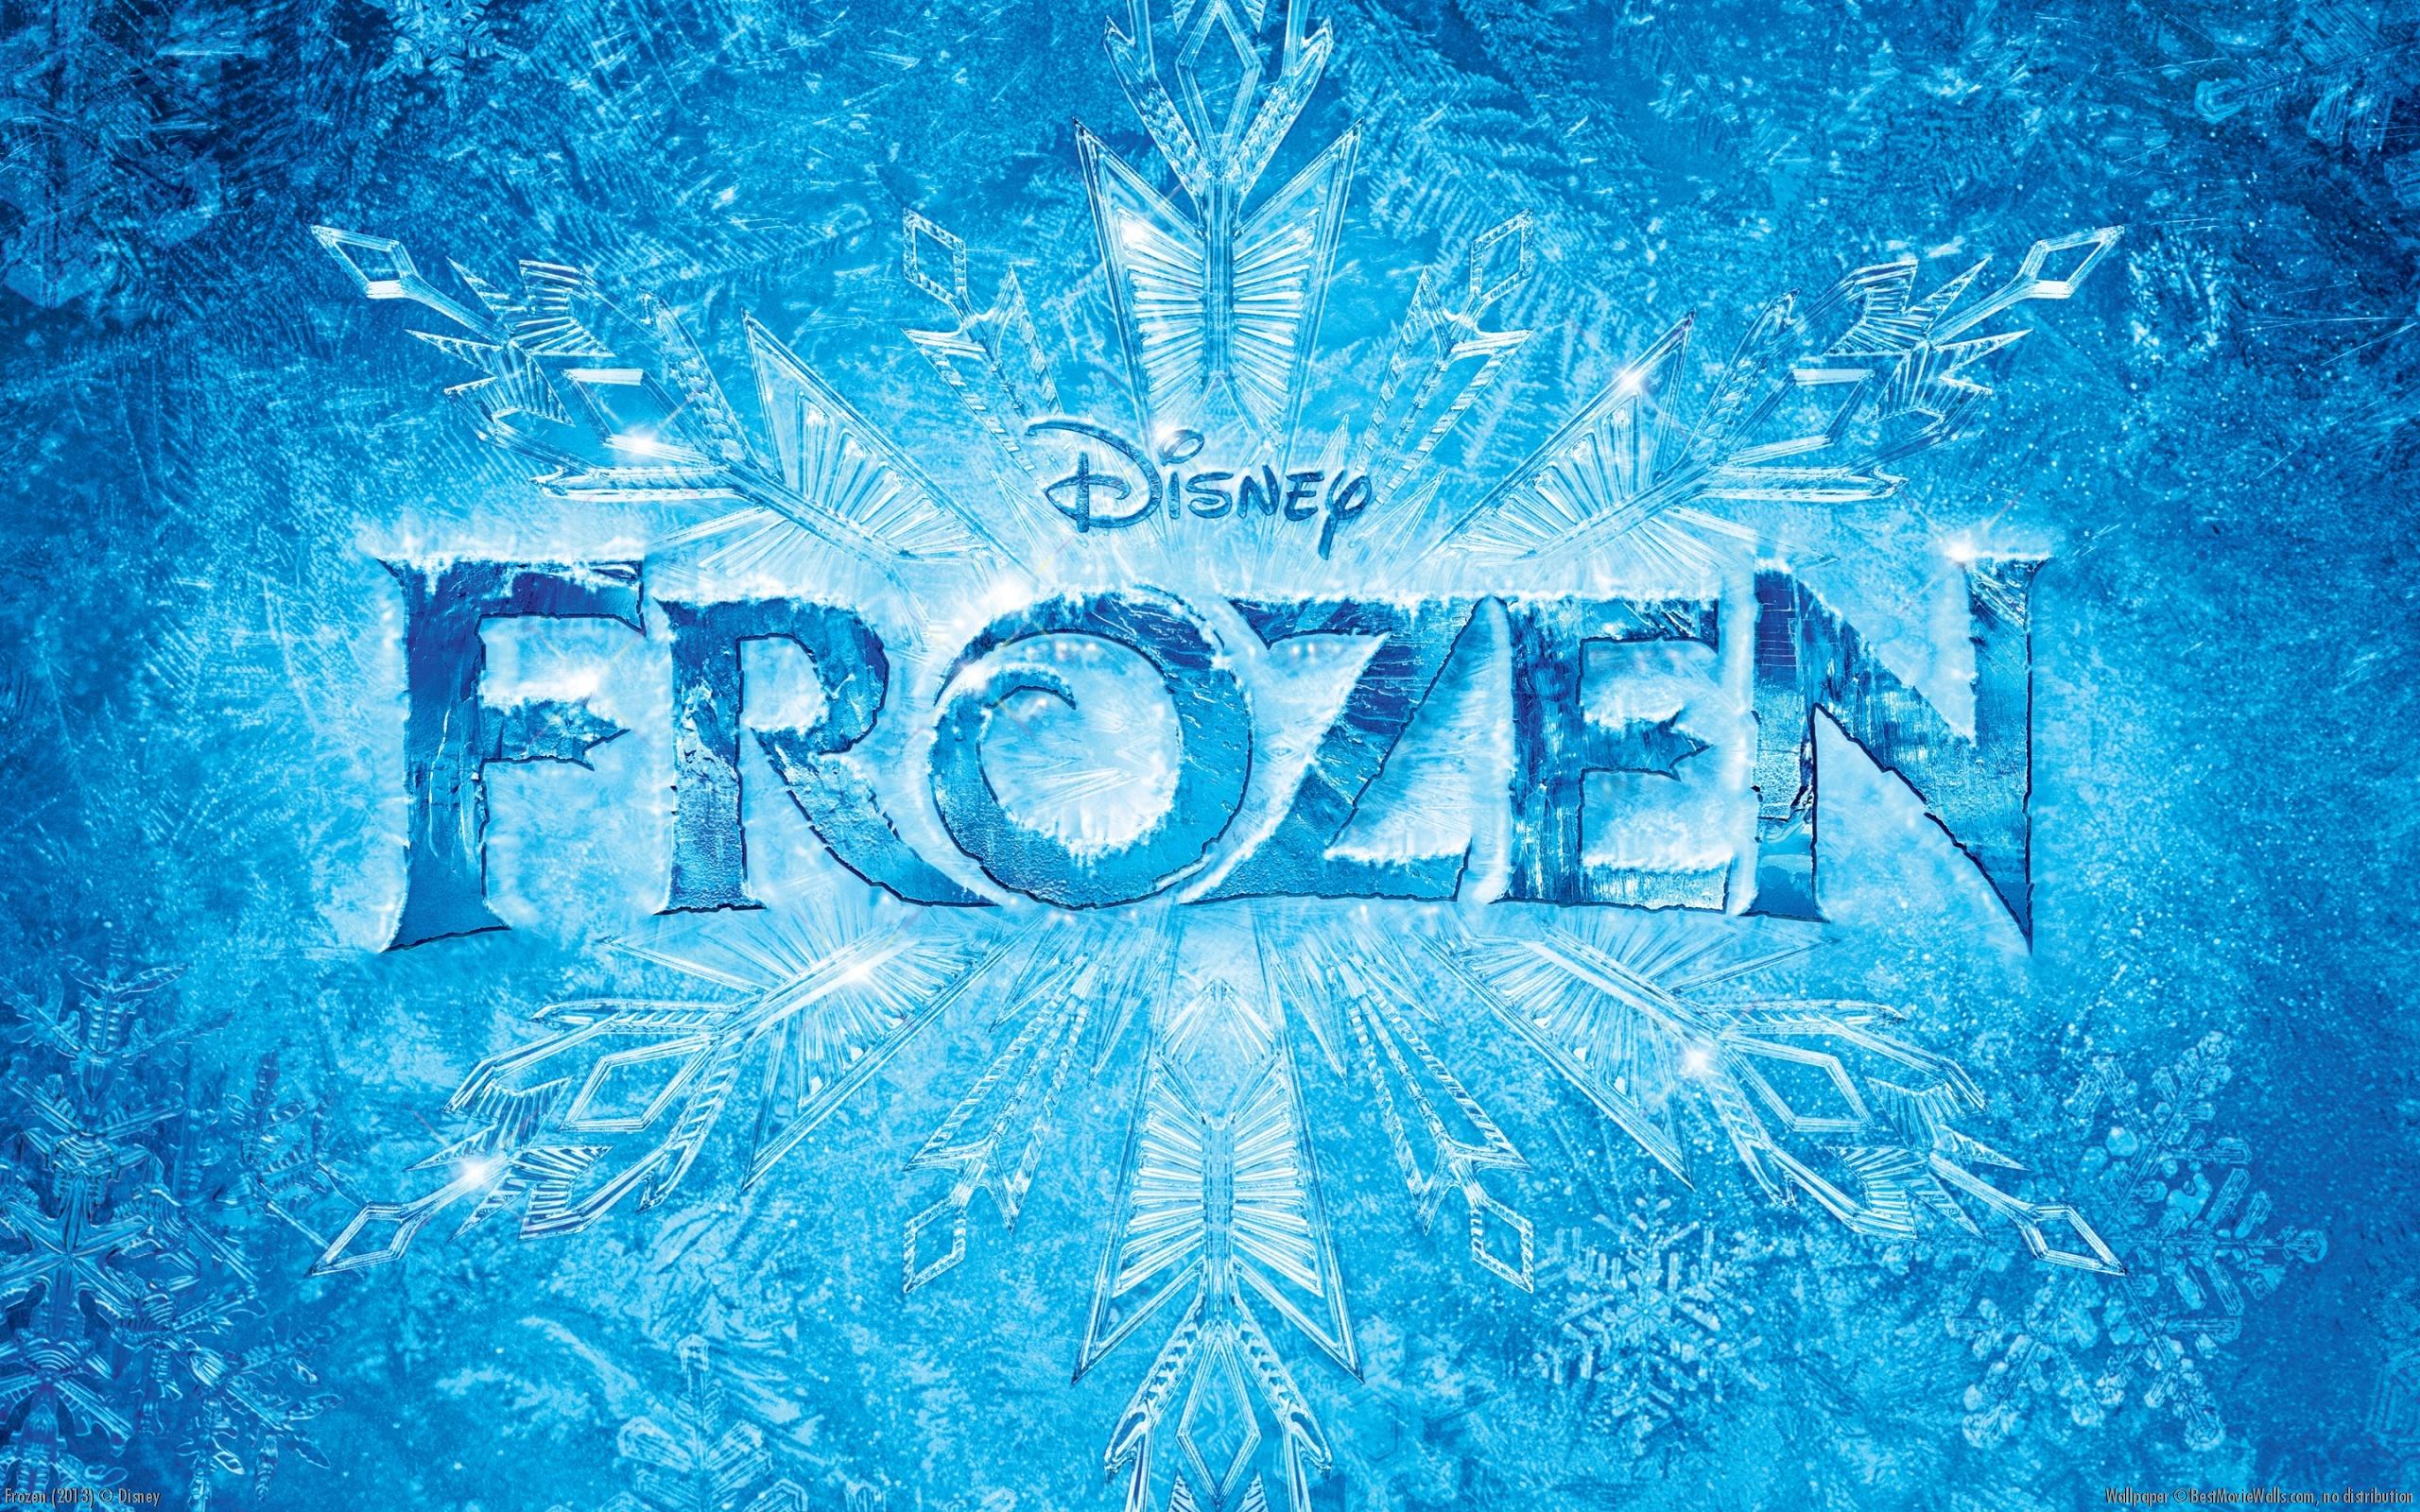 Frozen anuncia musical de Broadway y película navideña